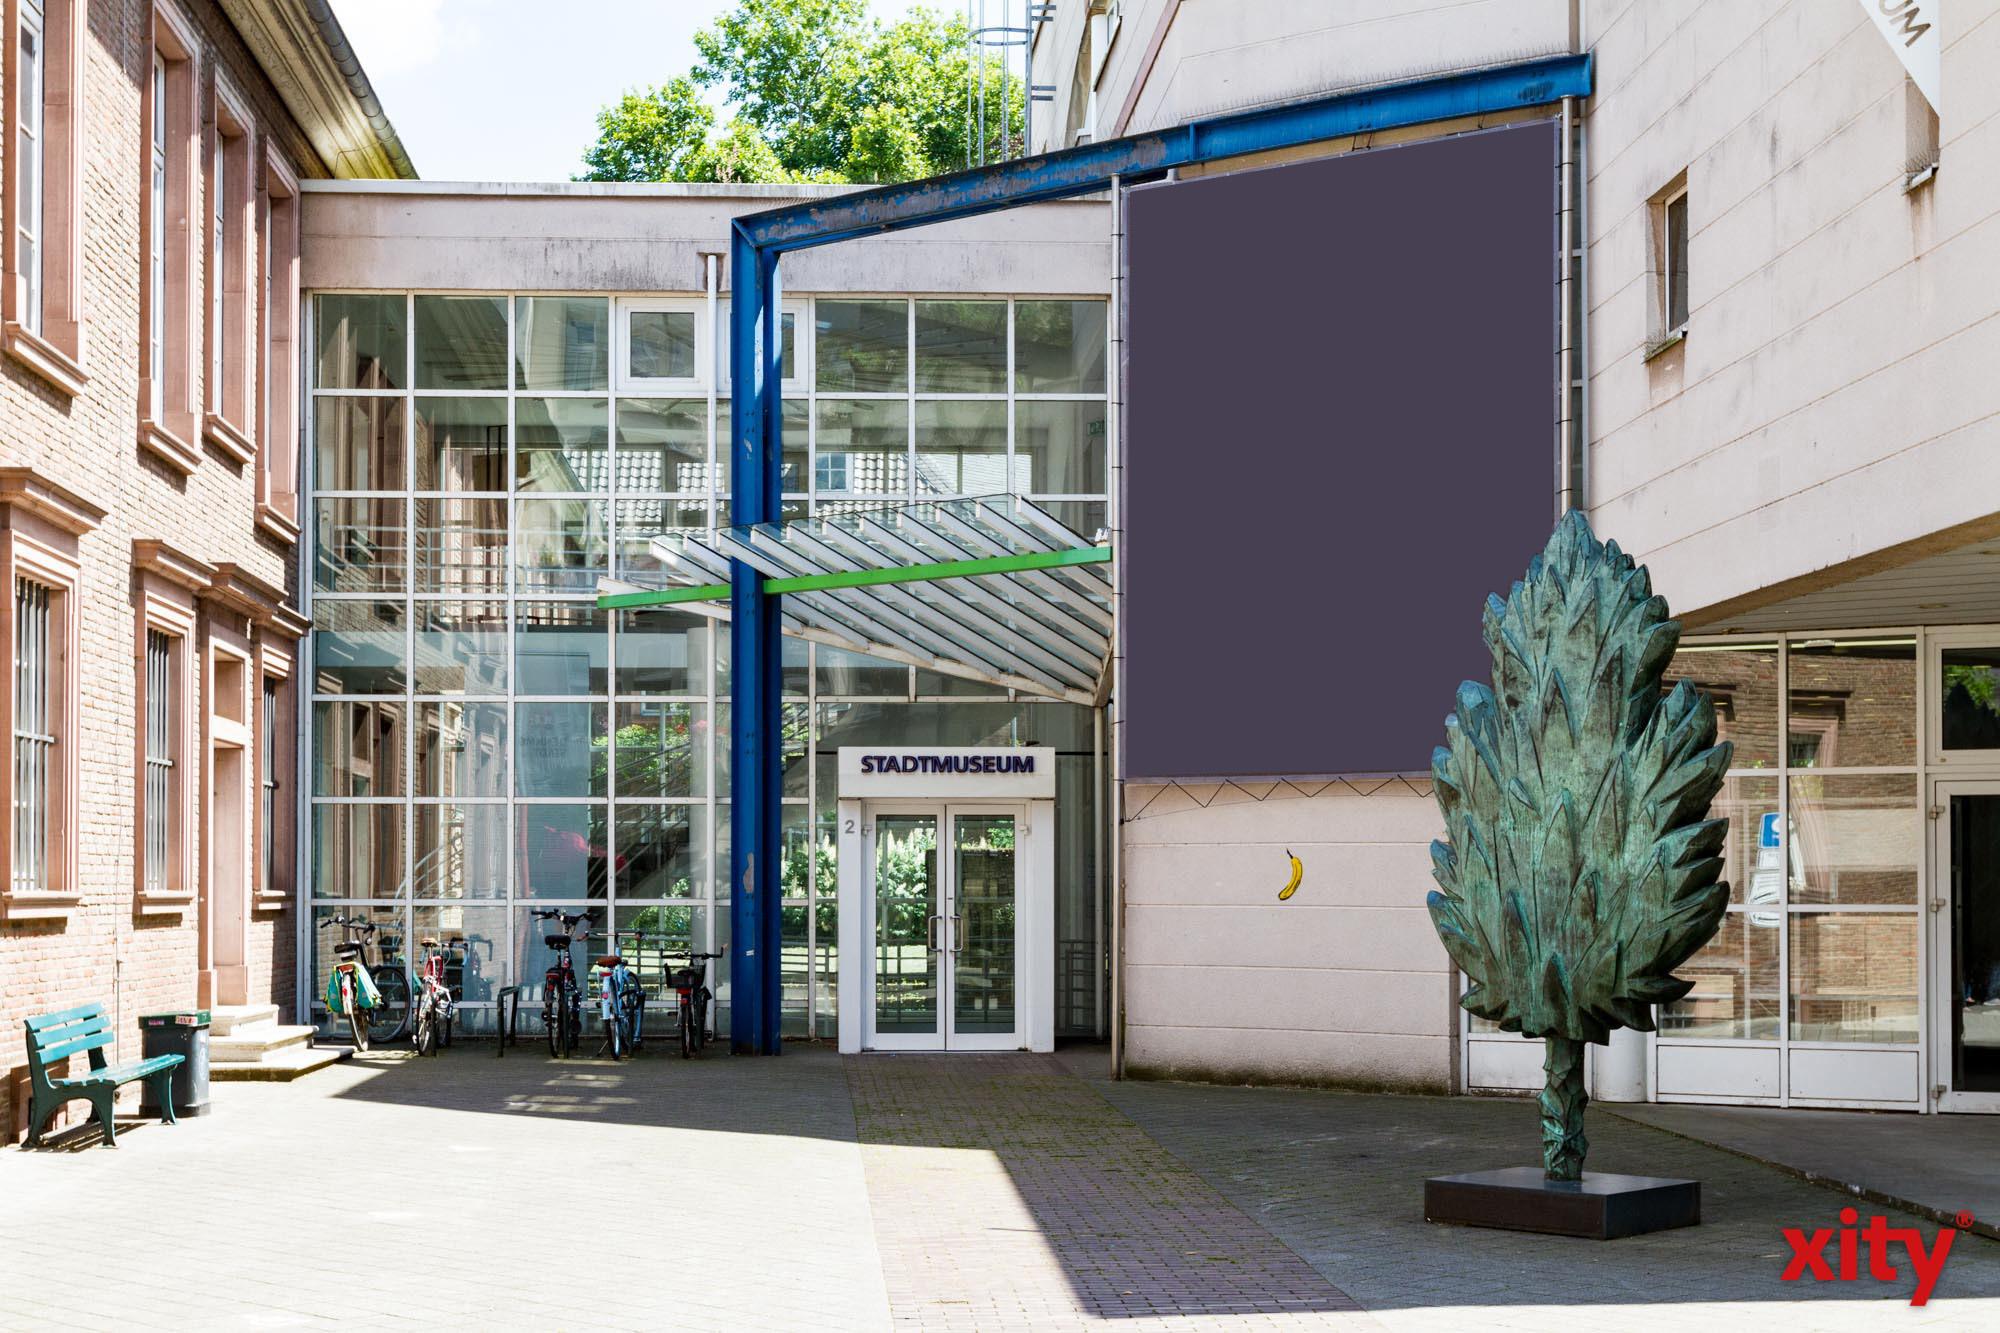 Ferienprogramm im Stadtmuseum Düsseldorf (Foto: xity)